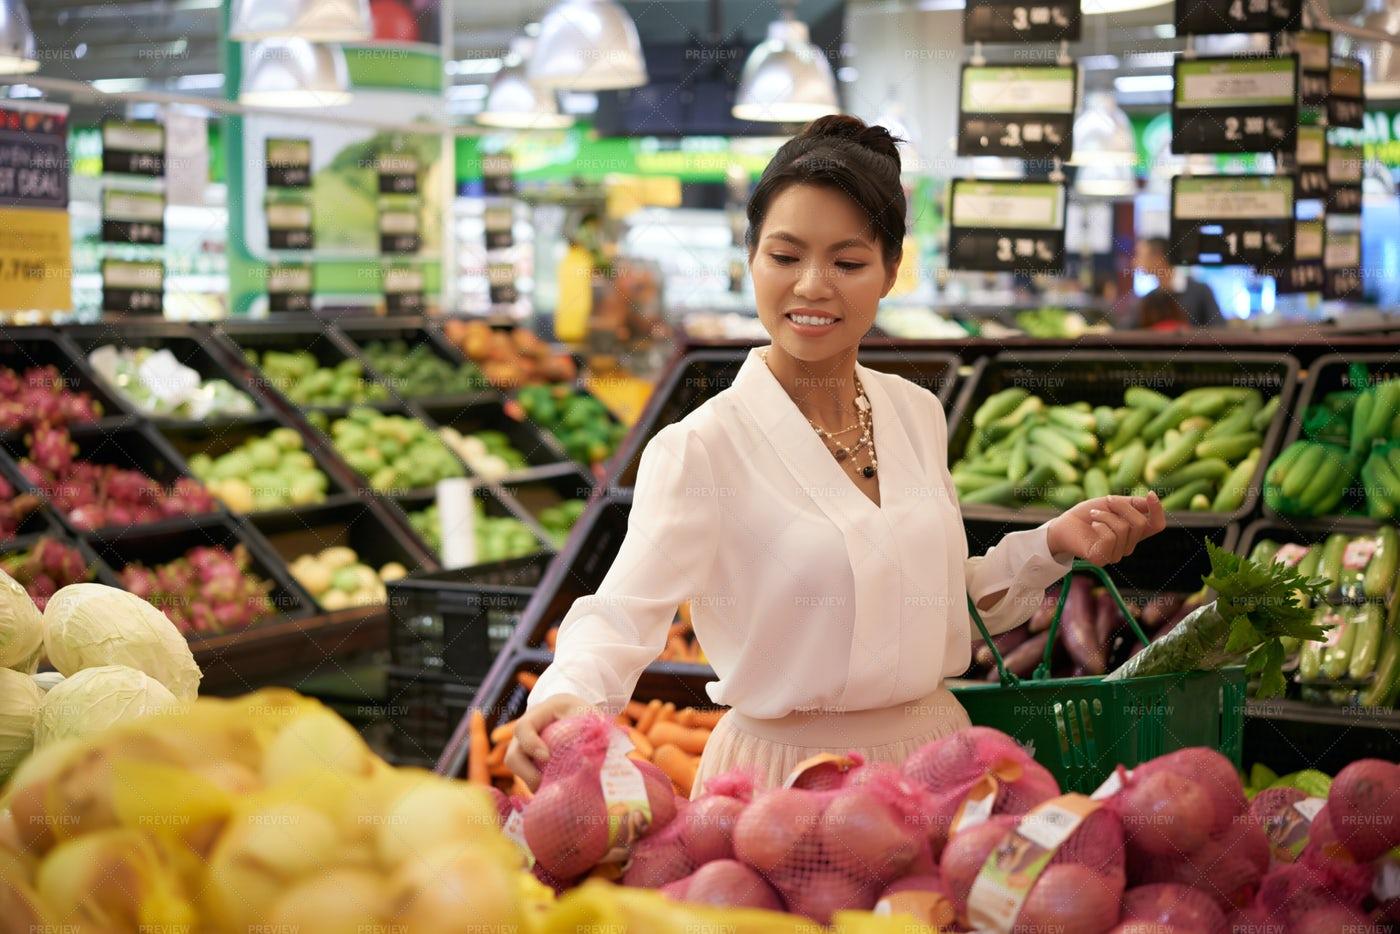 Grocery Shopping: Stock Photos